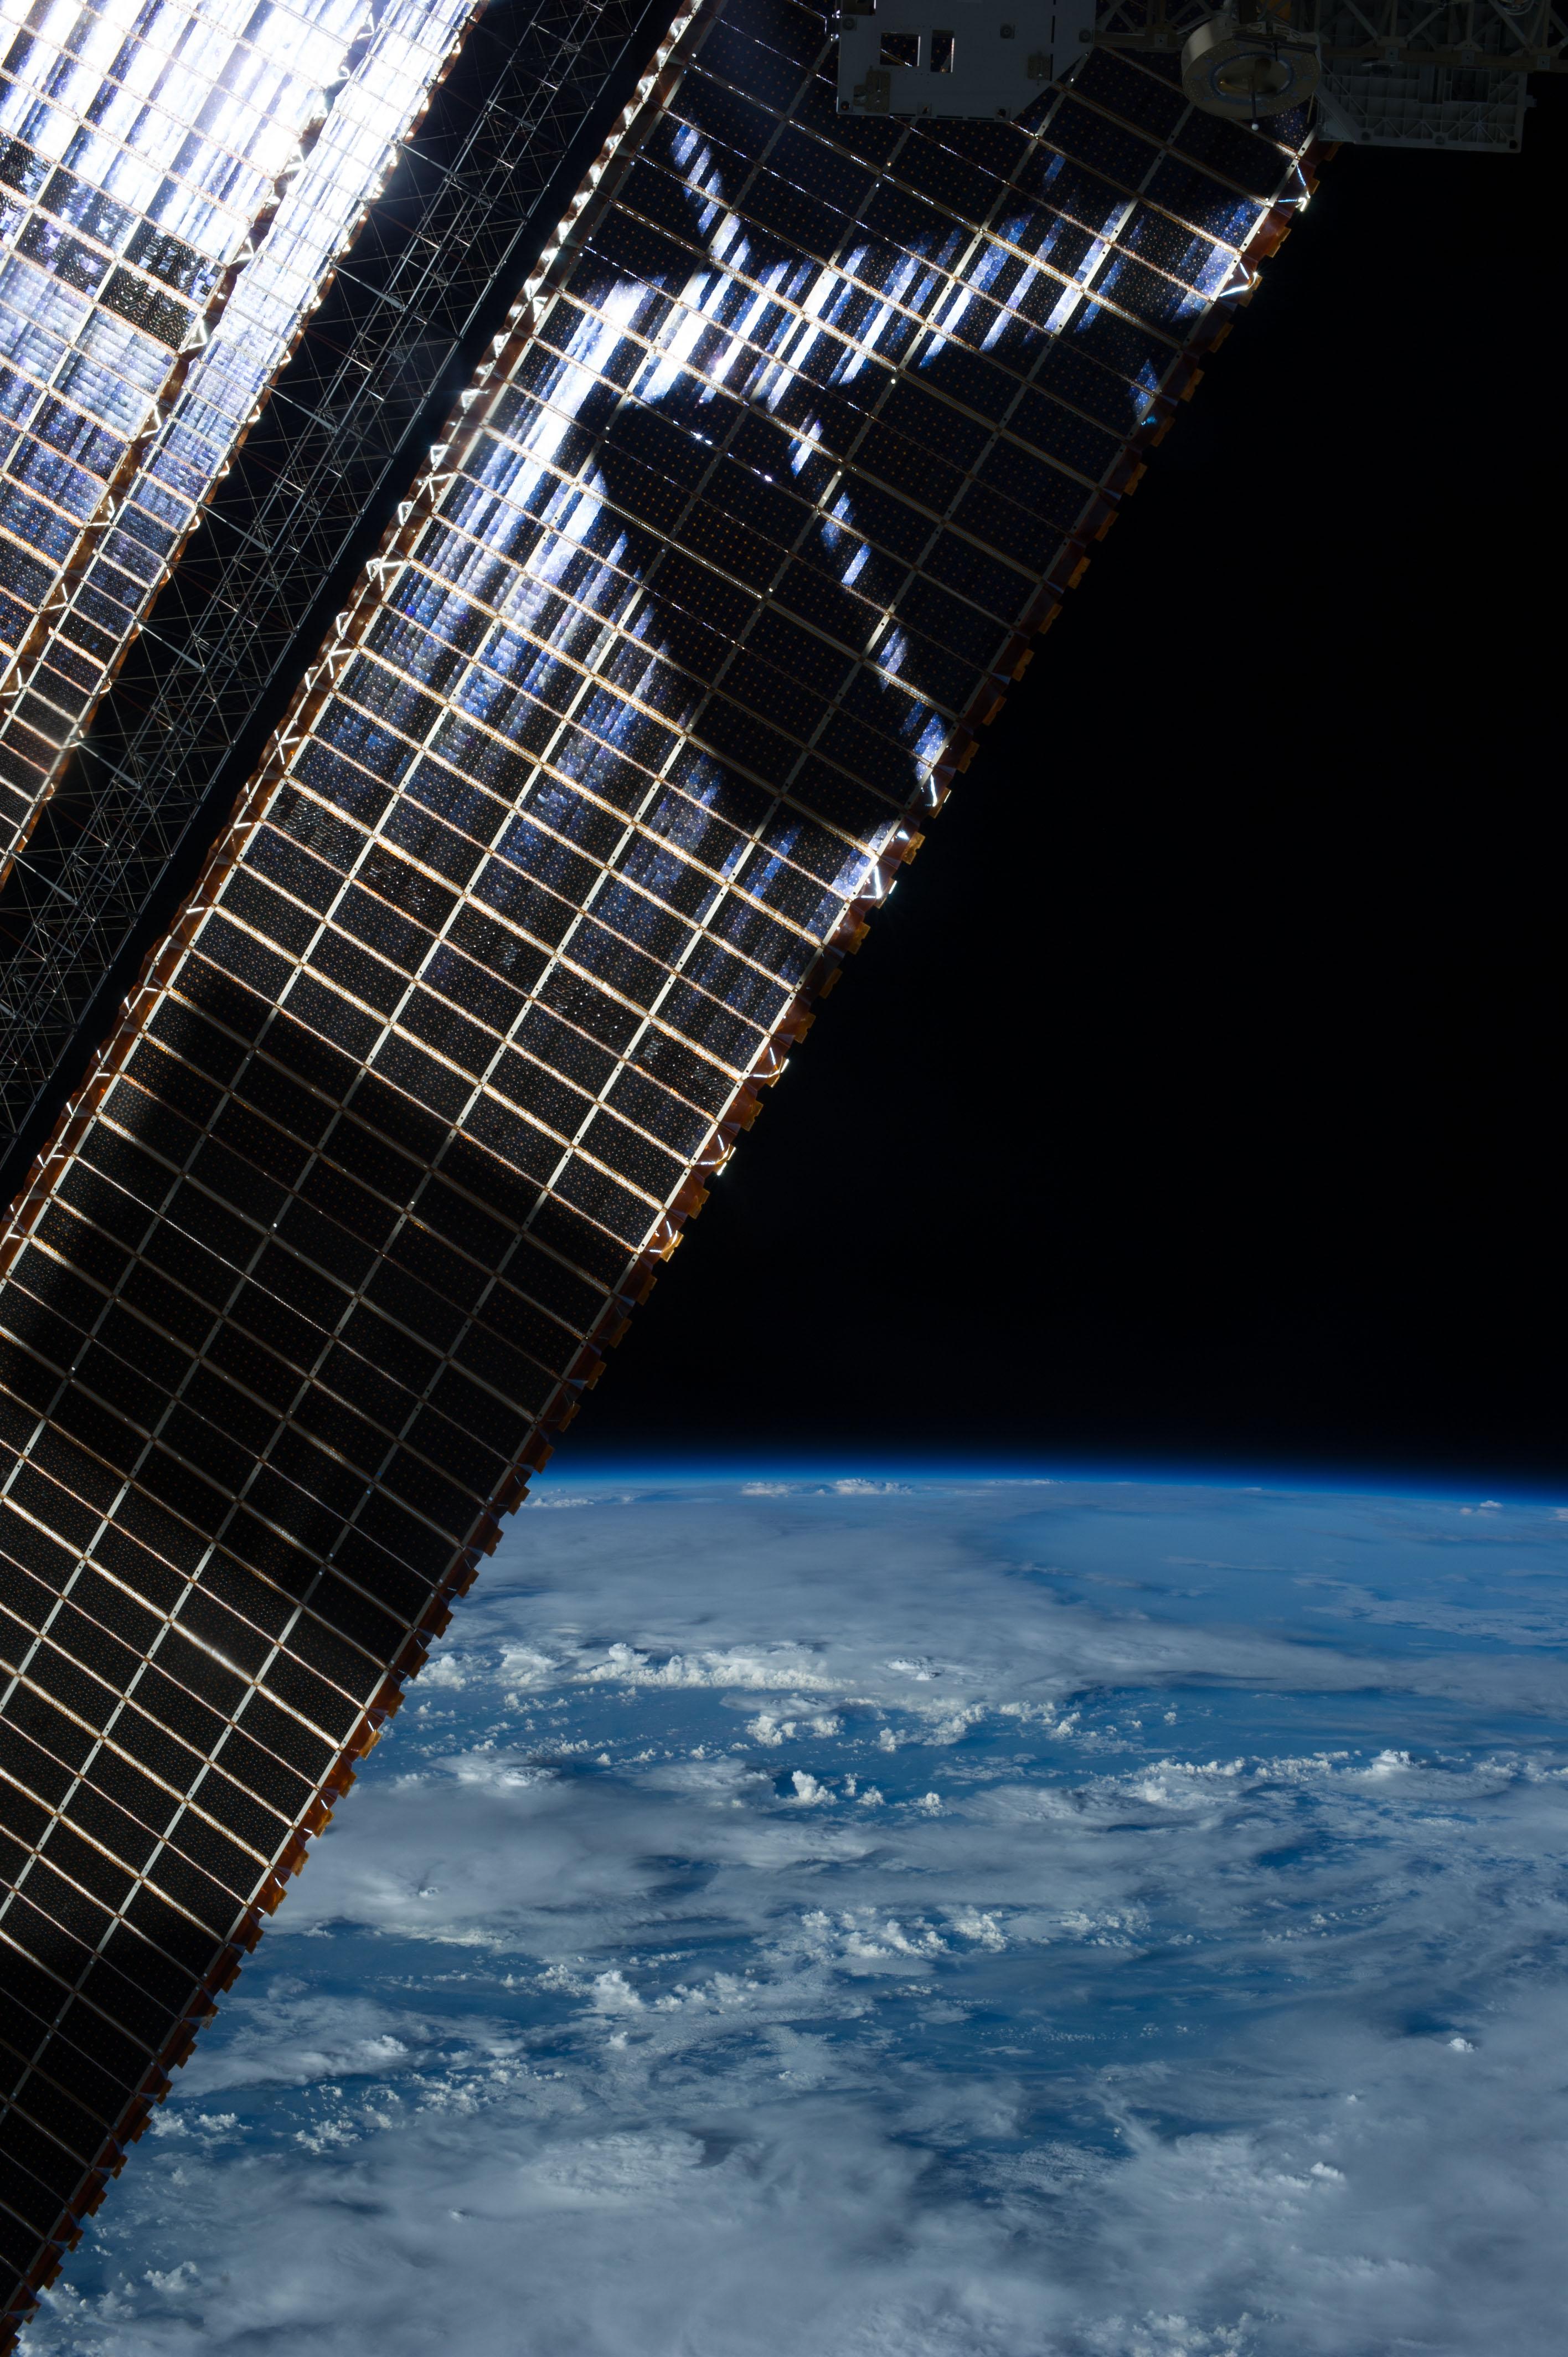 spacecraft solar array panels - photo #20